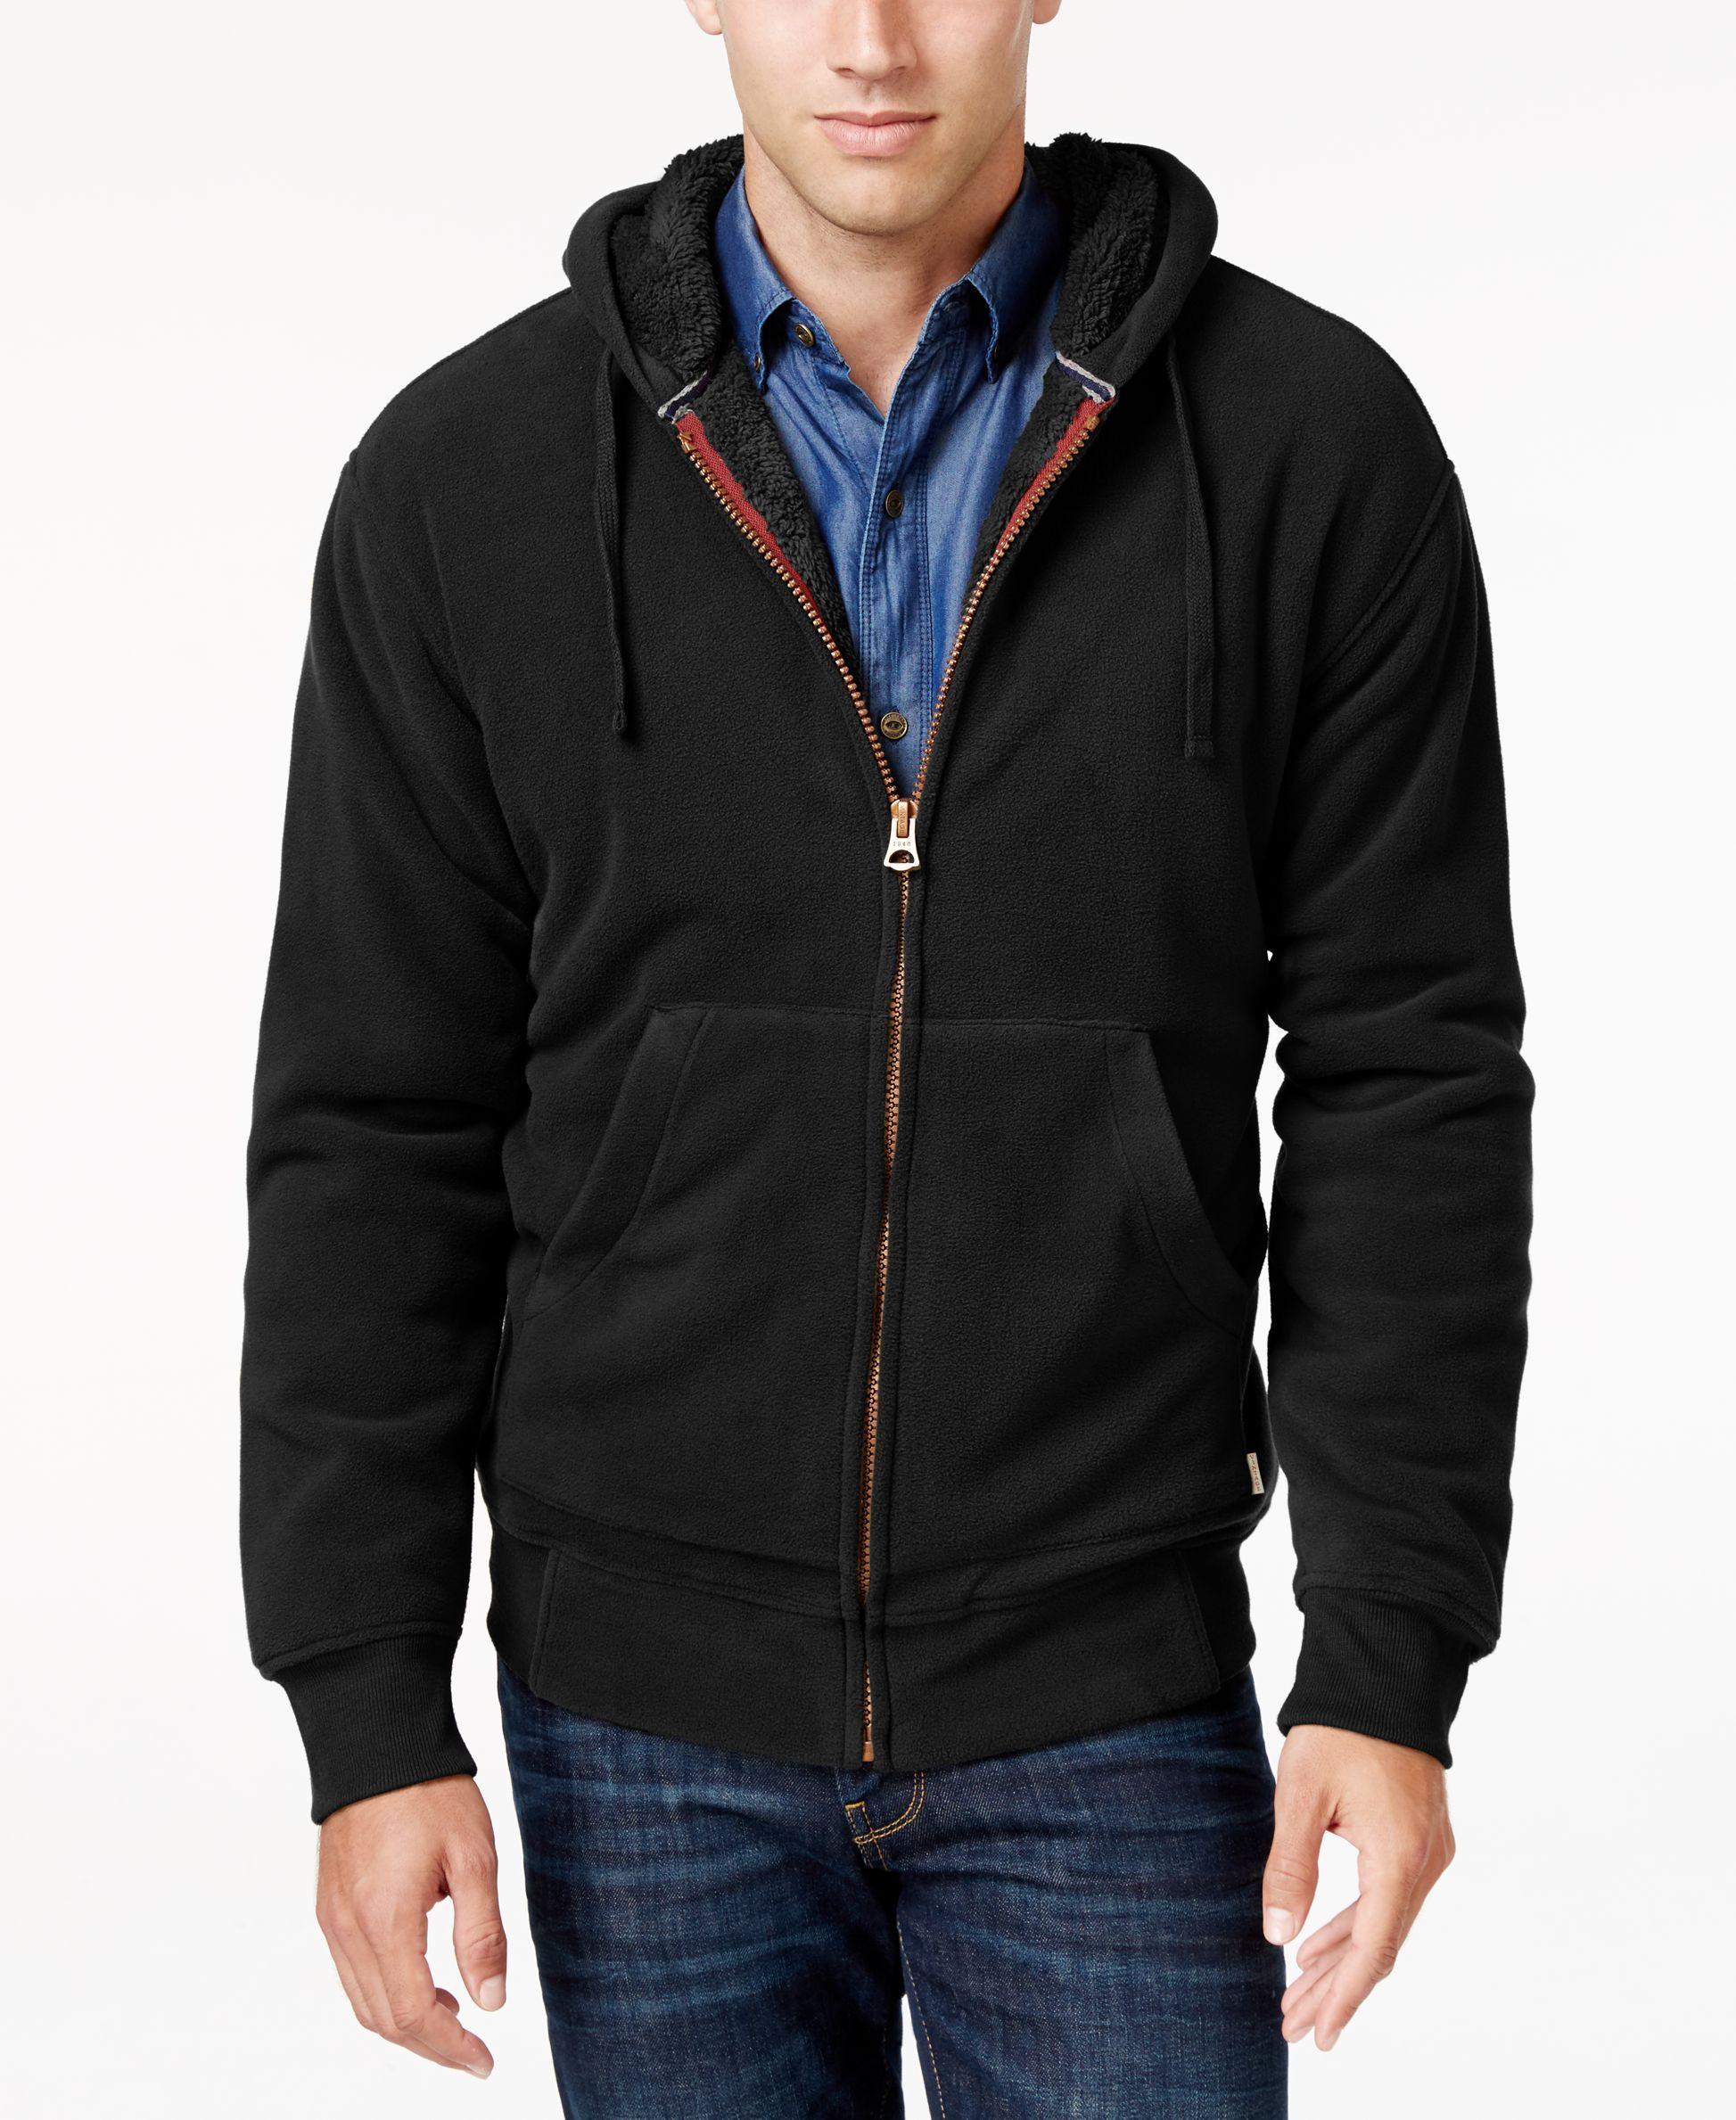 Weatherproof Vintage Men's Faux Sherpa-Lined Hoodie, Classic Fit